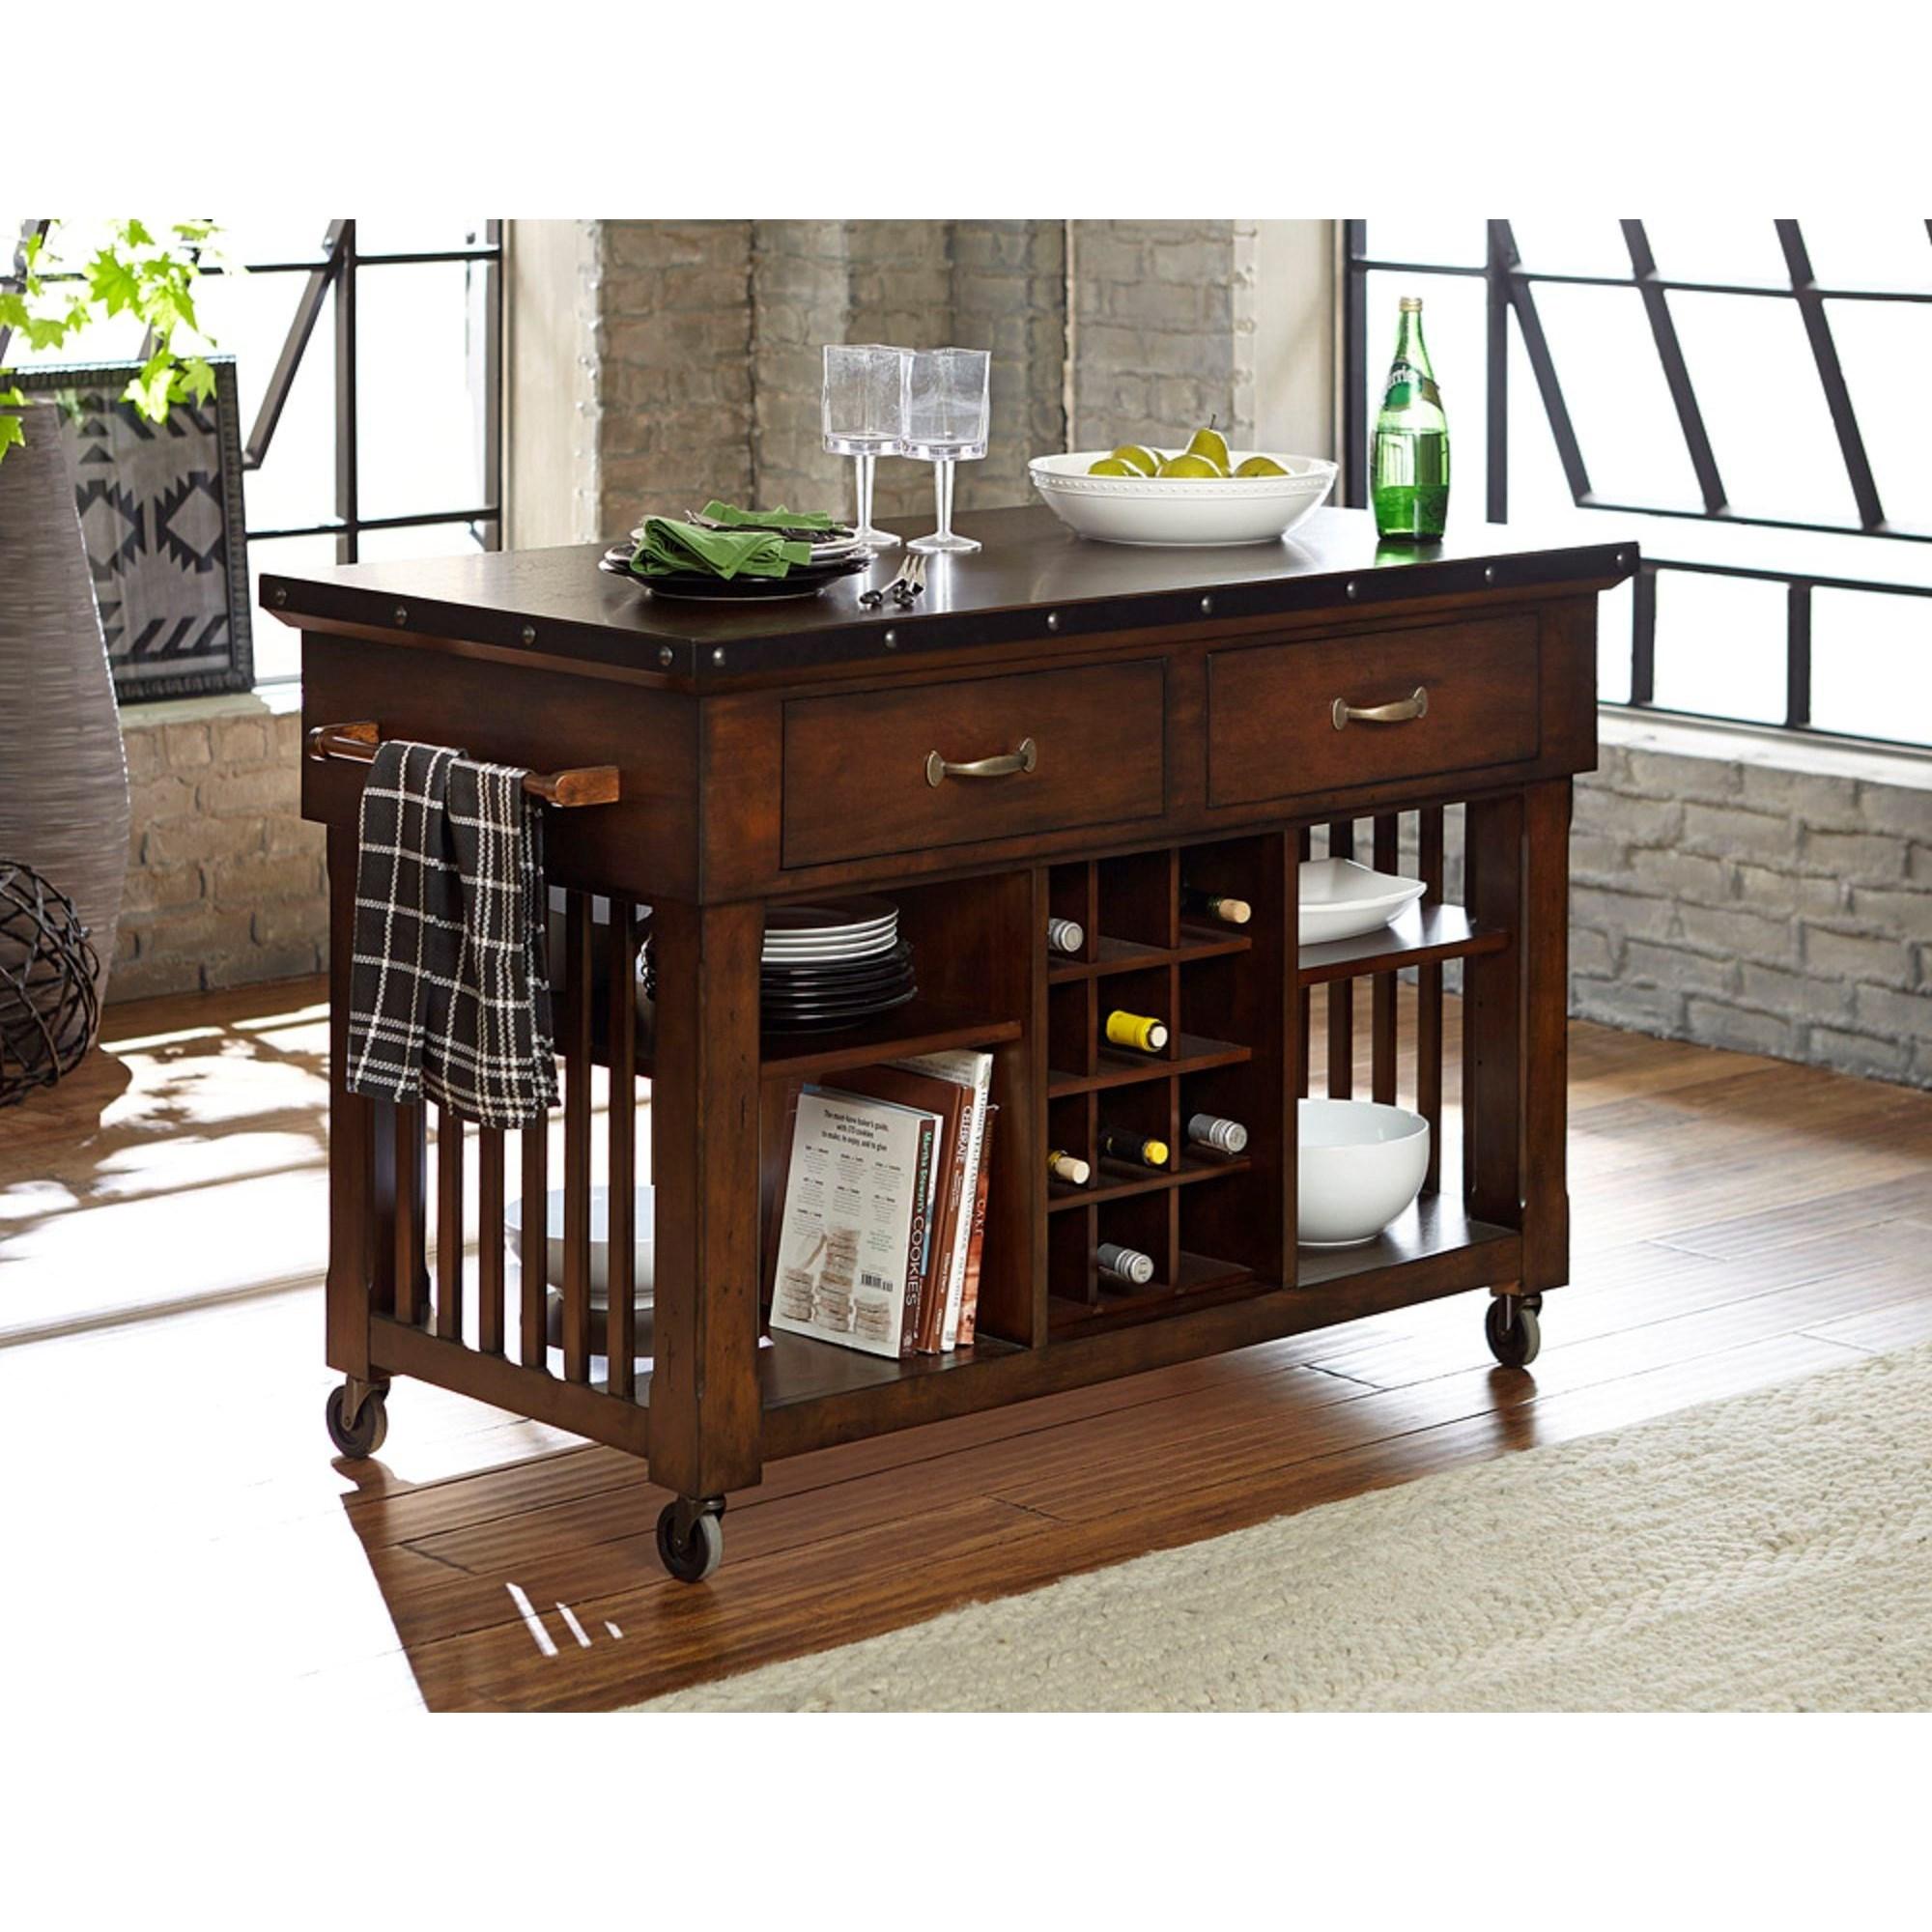 Schleiger Kitchen Island Cart by Homelegance at Value City Furniture